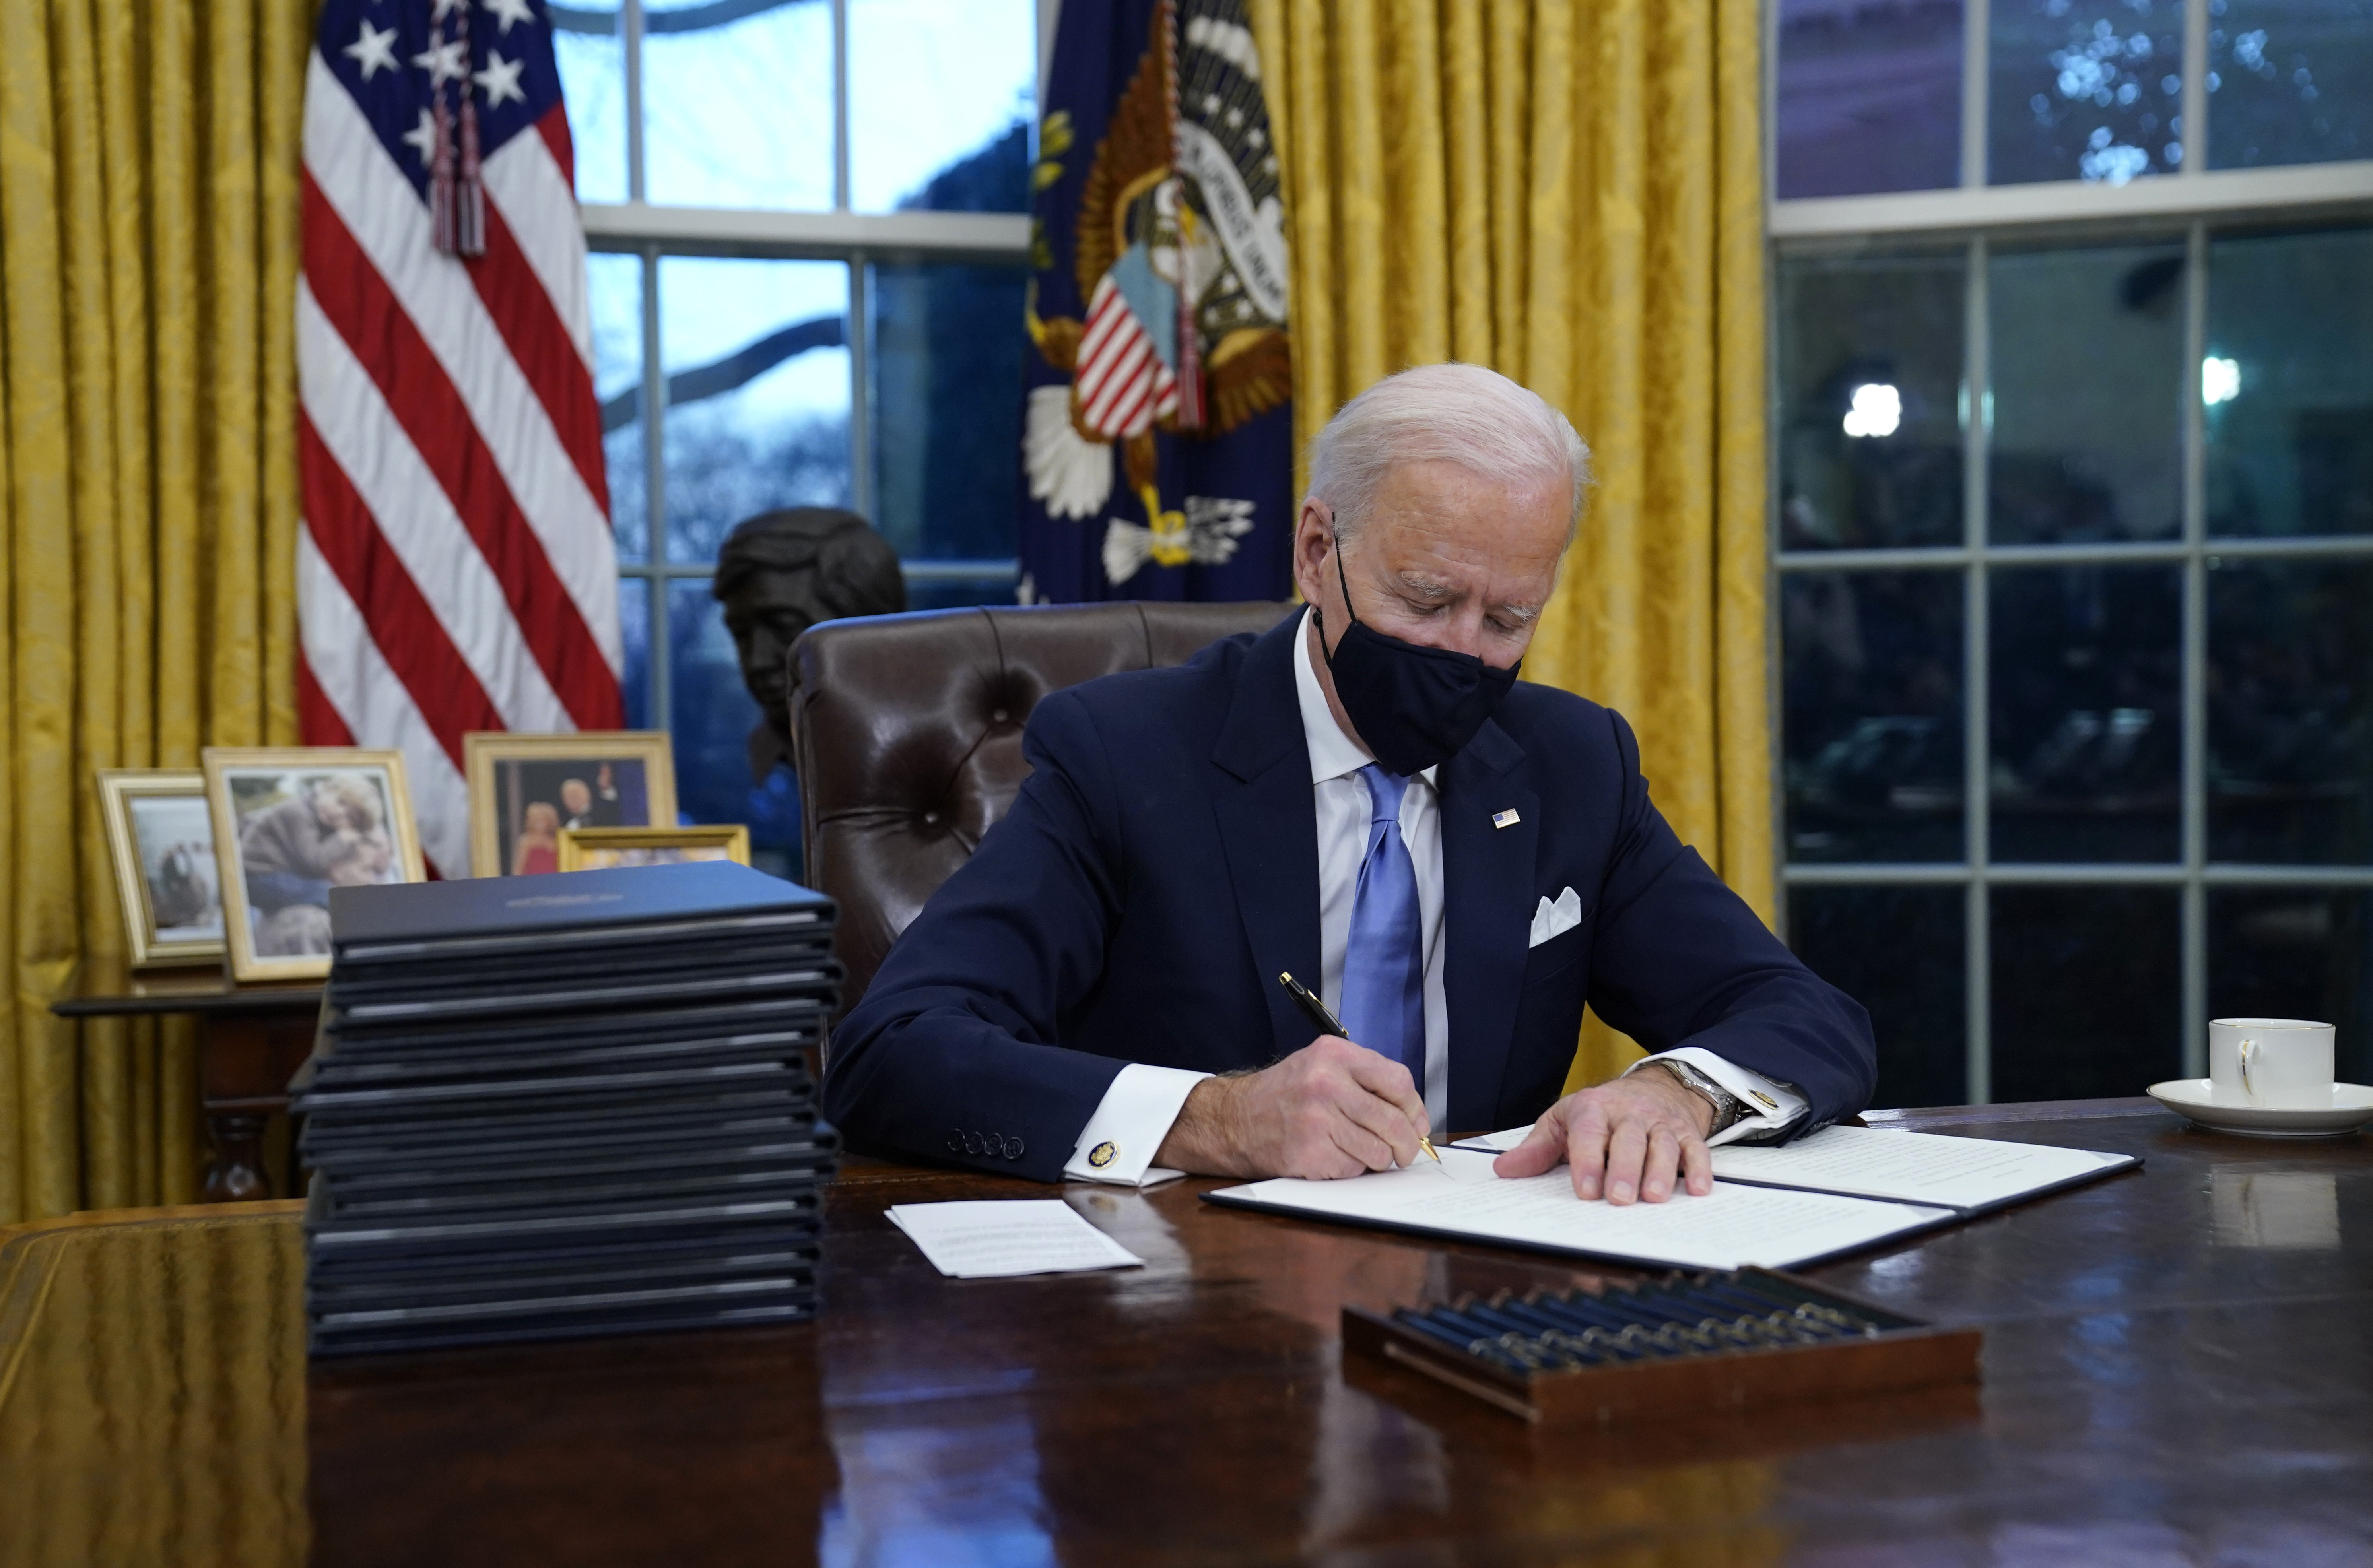 Photos President Biden S Redecorated Oval Office President Biden Takes Office Npr